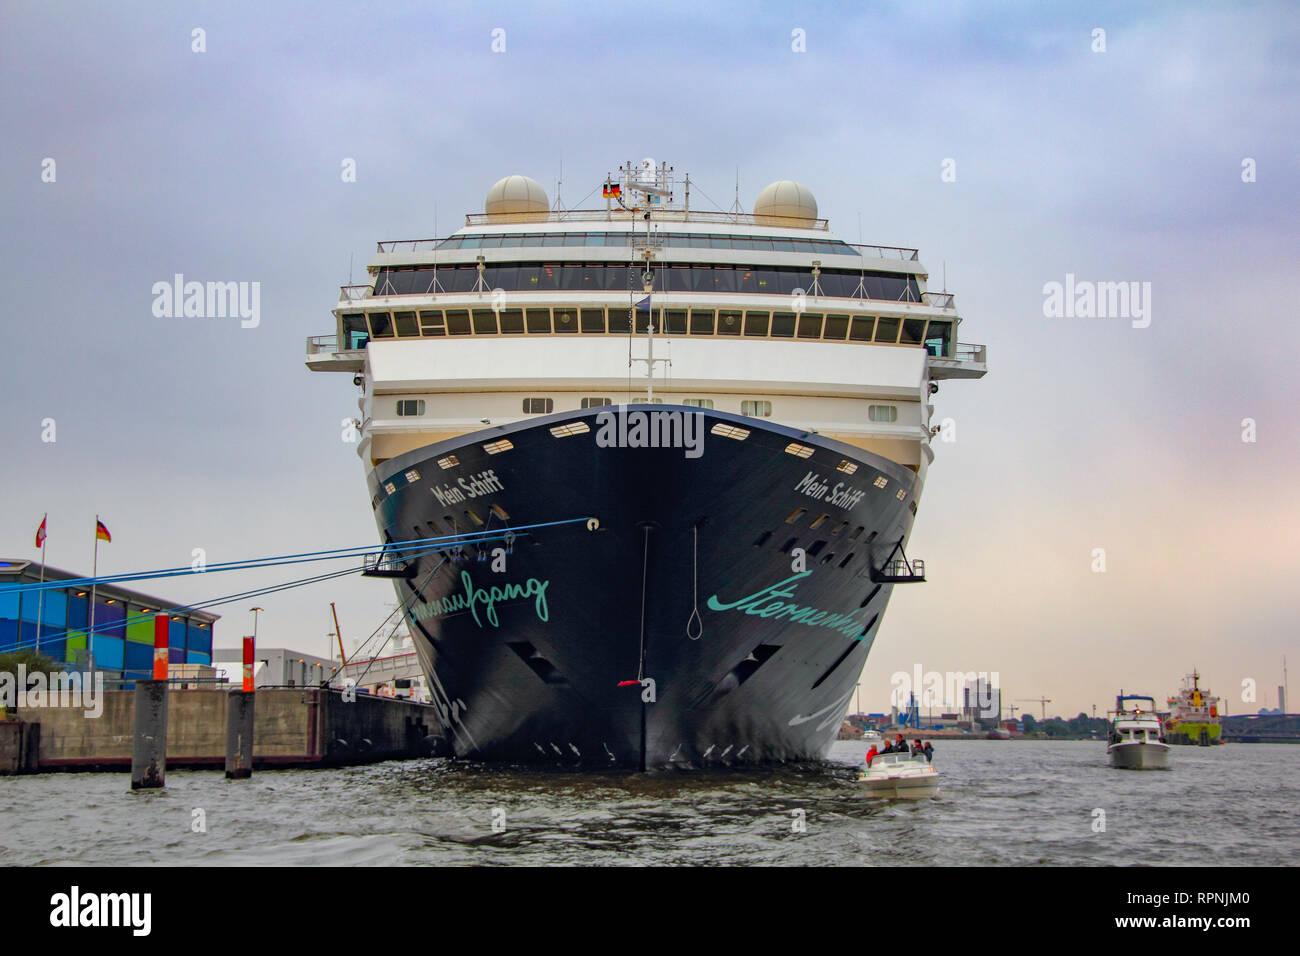 Mein Schiff Valletta cruise ship total front view in Hamburg harbor archival 2010 - Stock Image